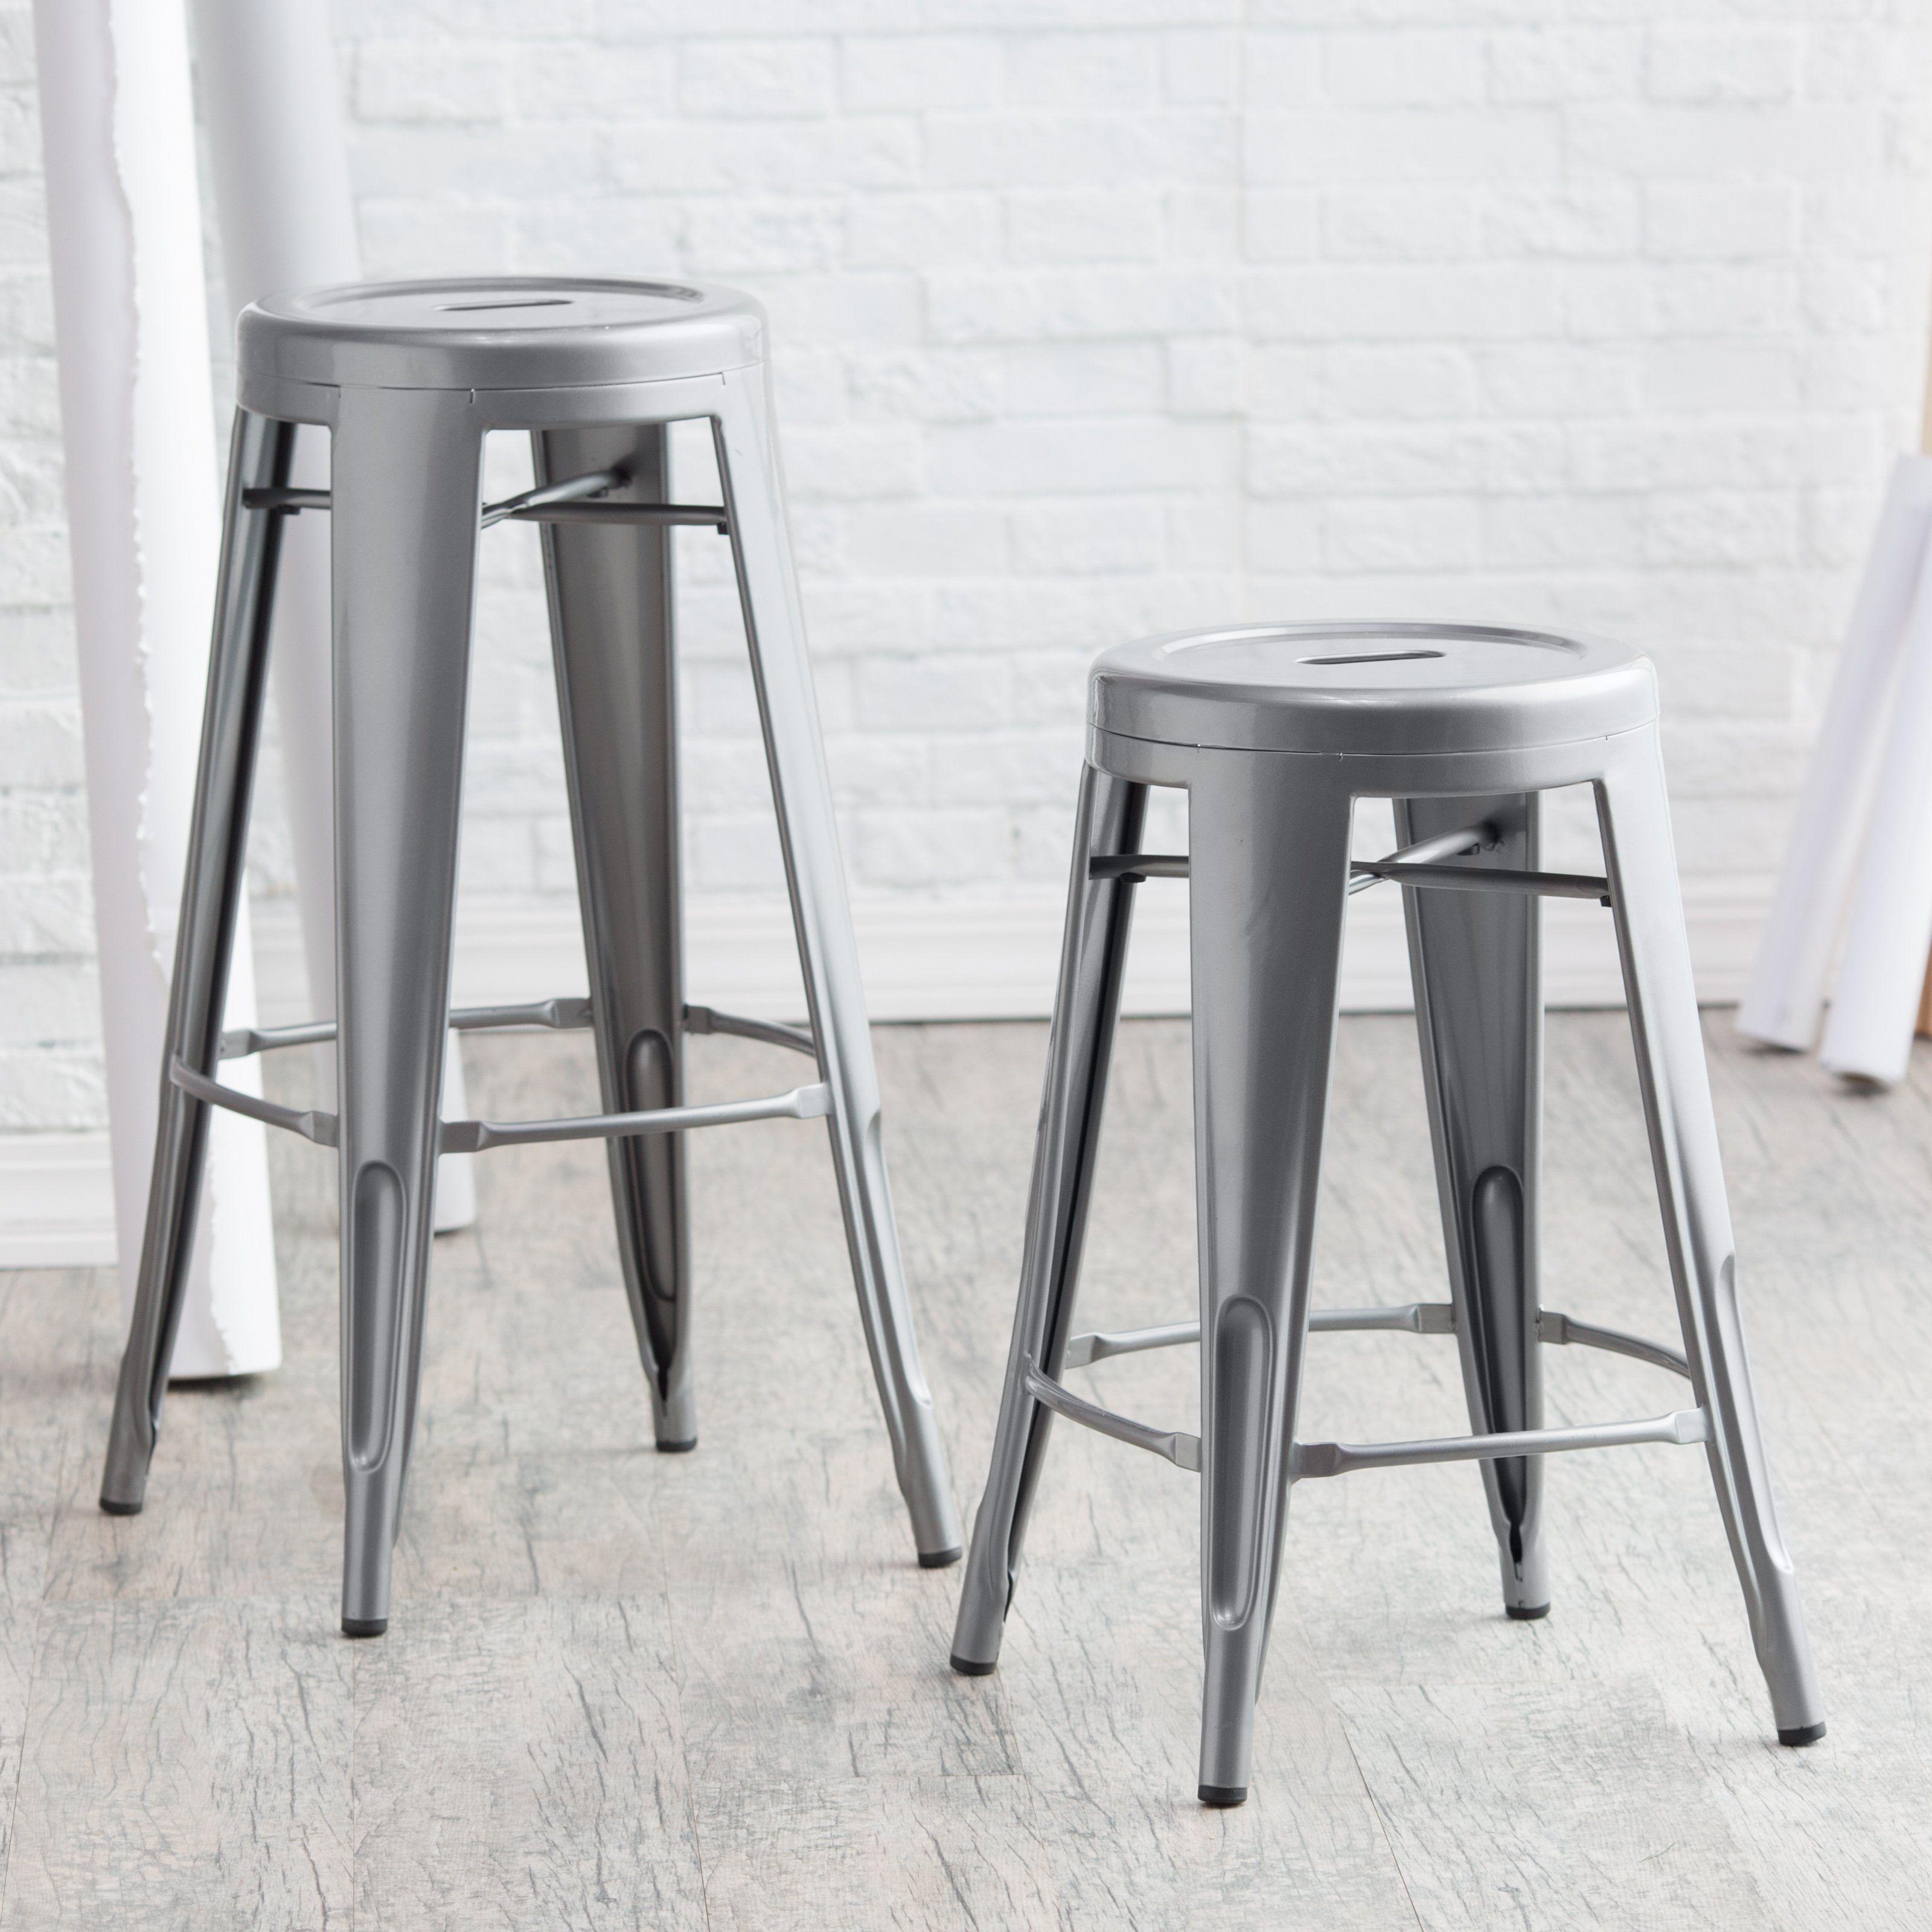 island full walmart size counter for swivel market metal of stools emeco outdoor tufted bar ideas navy world kitchen stool ikea